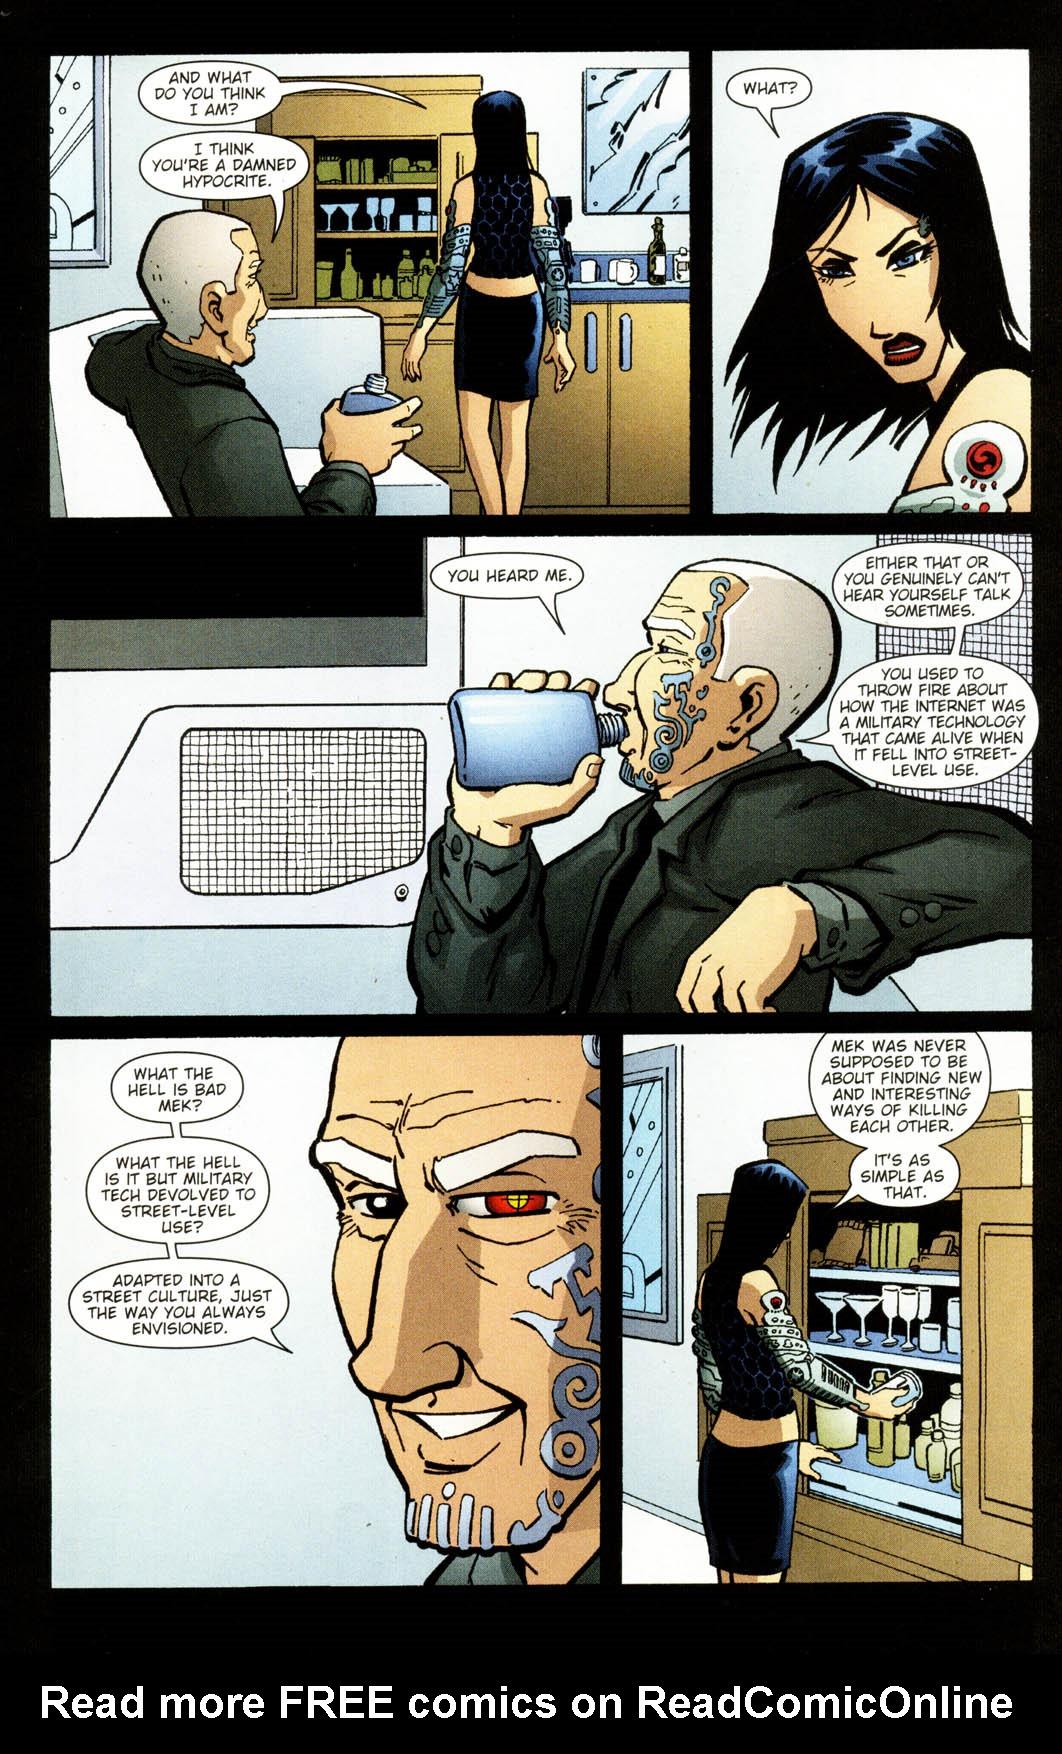 Read online Mek comic -  Issue #2 - 17